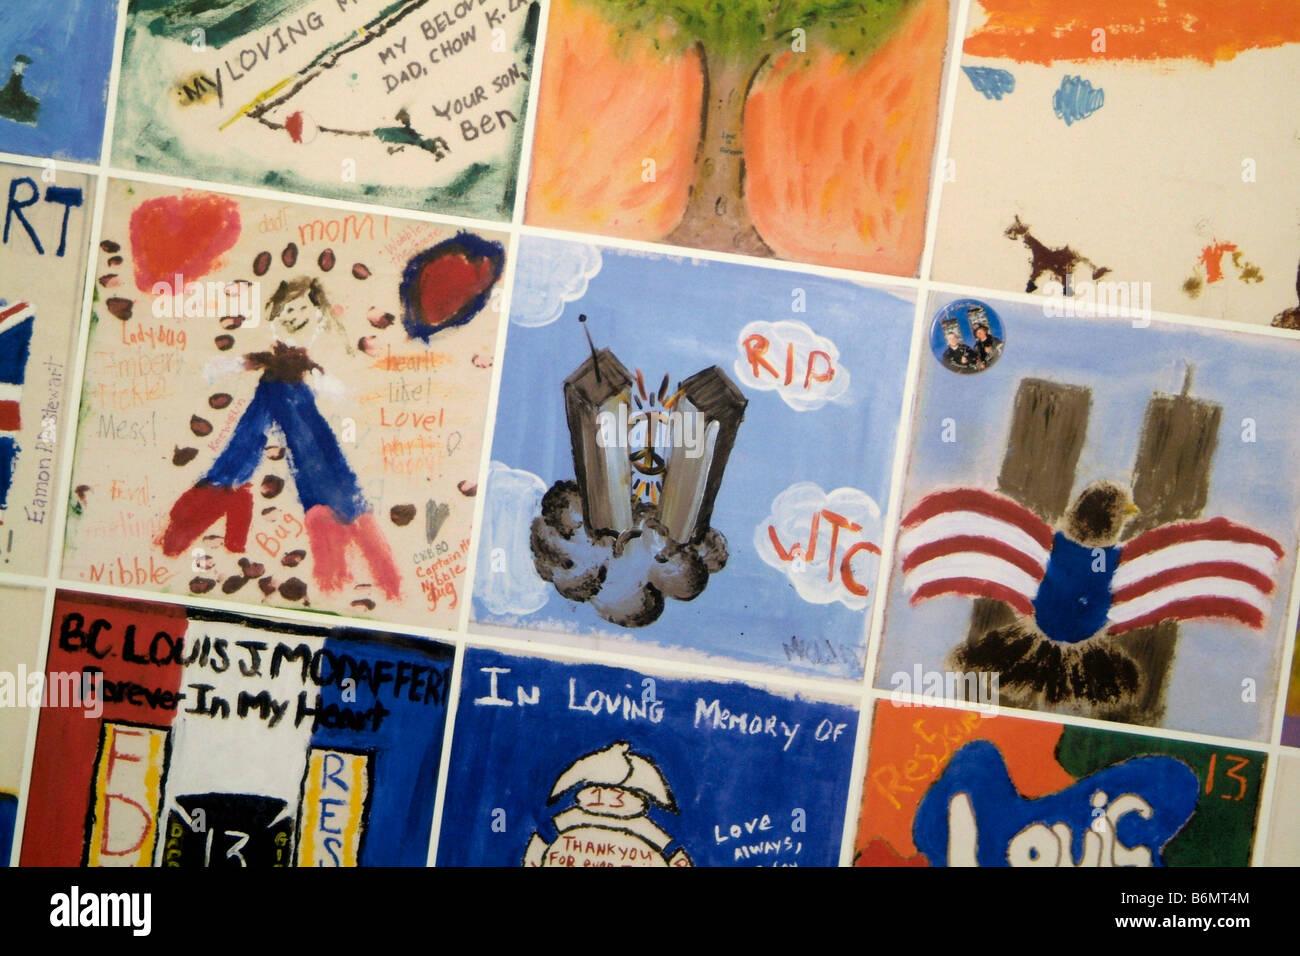 Children's painted memorial tiles at 9/11 Ground Zero New York, USA - Stock Image